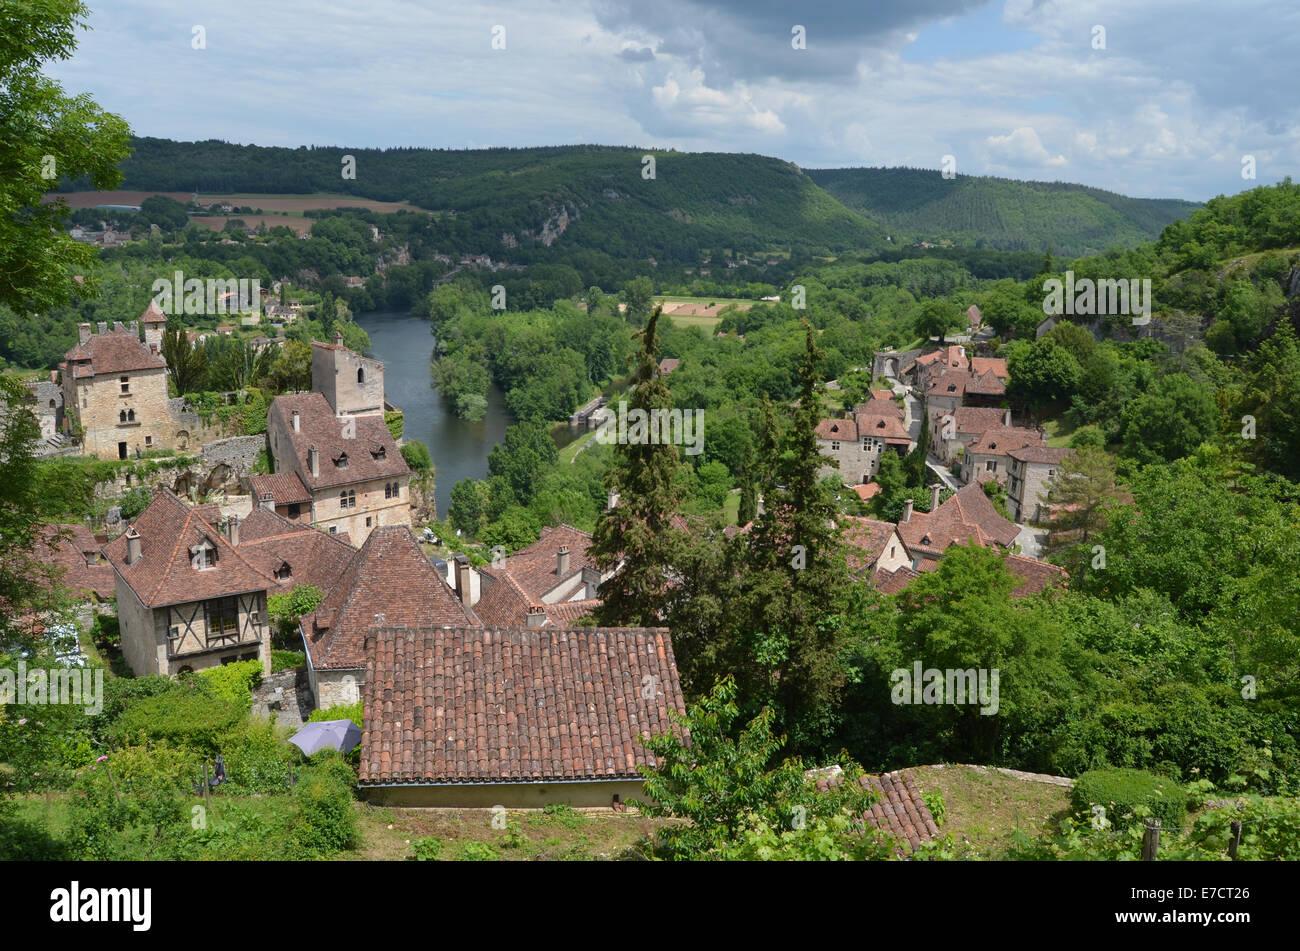 St Cirq la Popie, beautiful village in the Lot Region of SW France, May 2014 Stock Photo